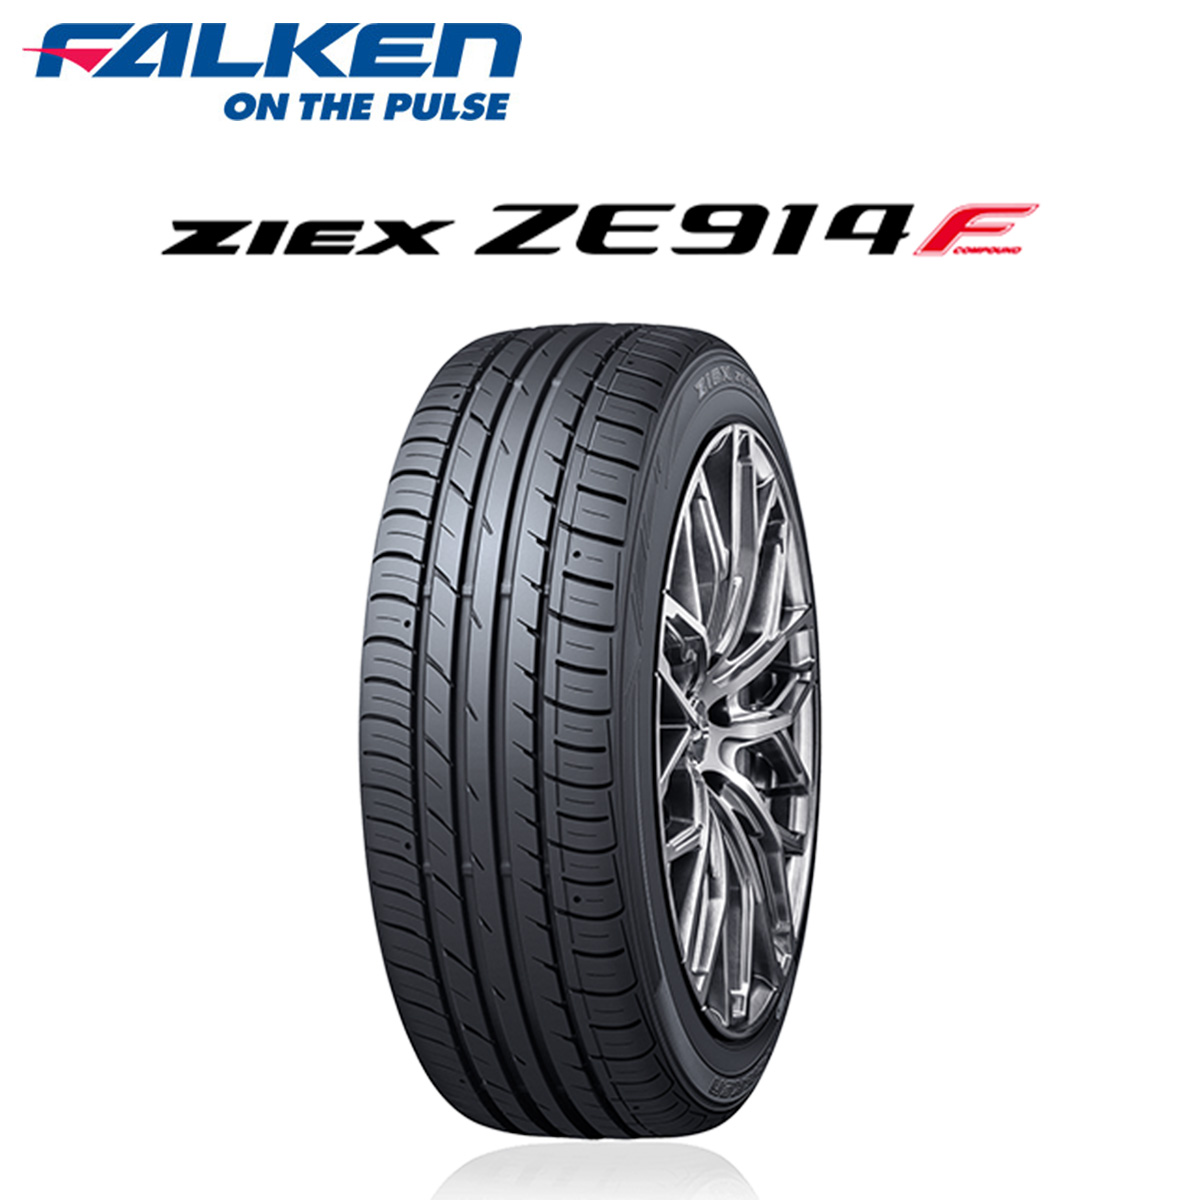 FALKEN ファルケン 低燃費 サマータイヤ 1本 18インチ 255/35R18 ZIEX ZE914F ジークス